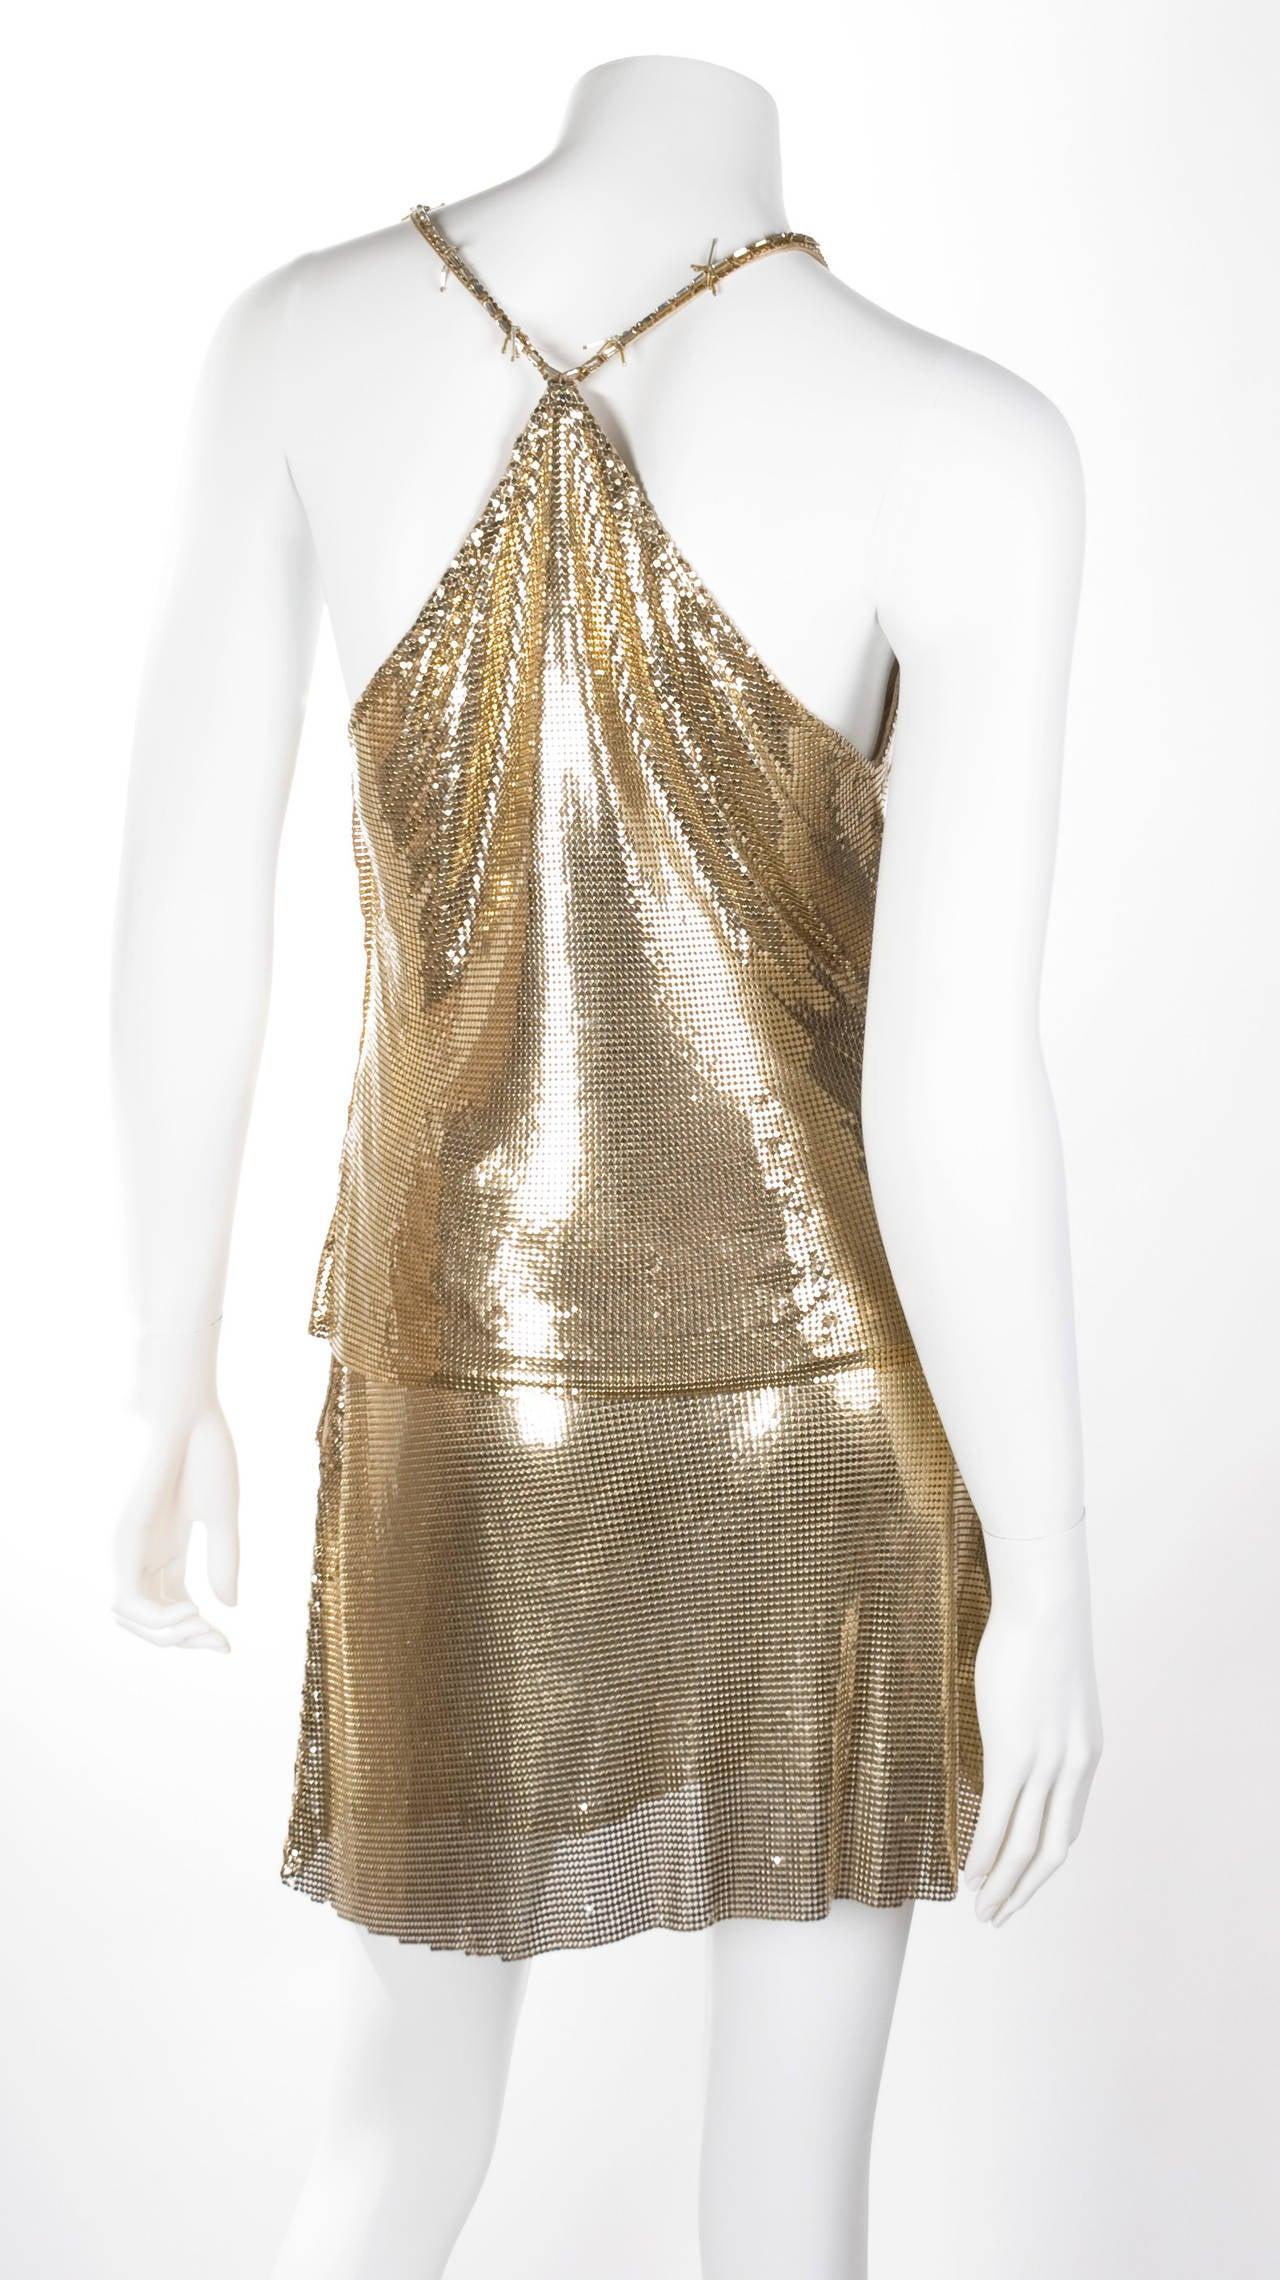 1982 Gianni Versace Couture Metal Mesh Oroton Top and Skirt 7